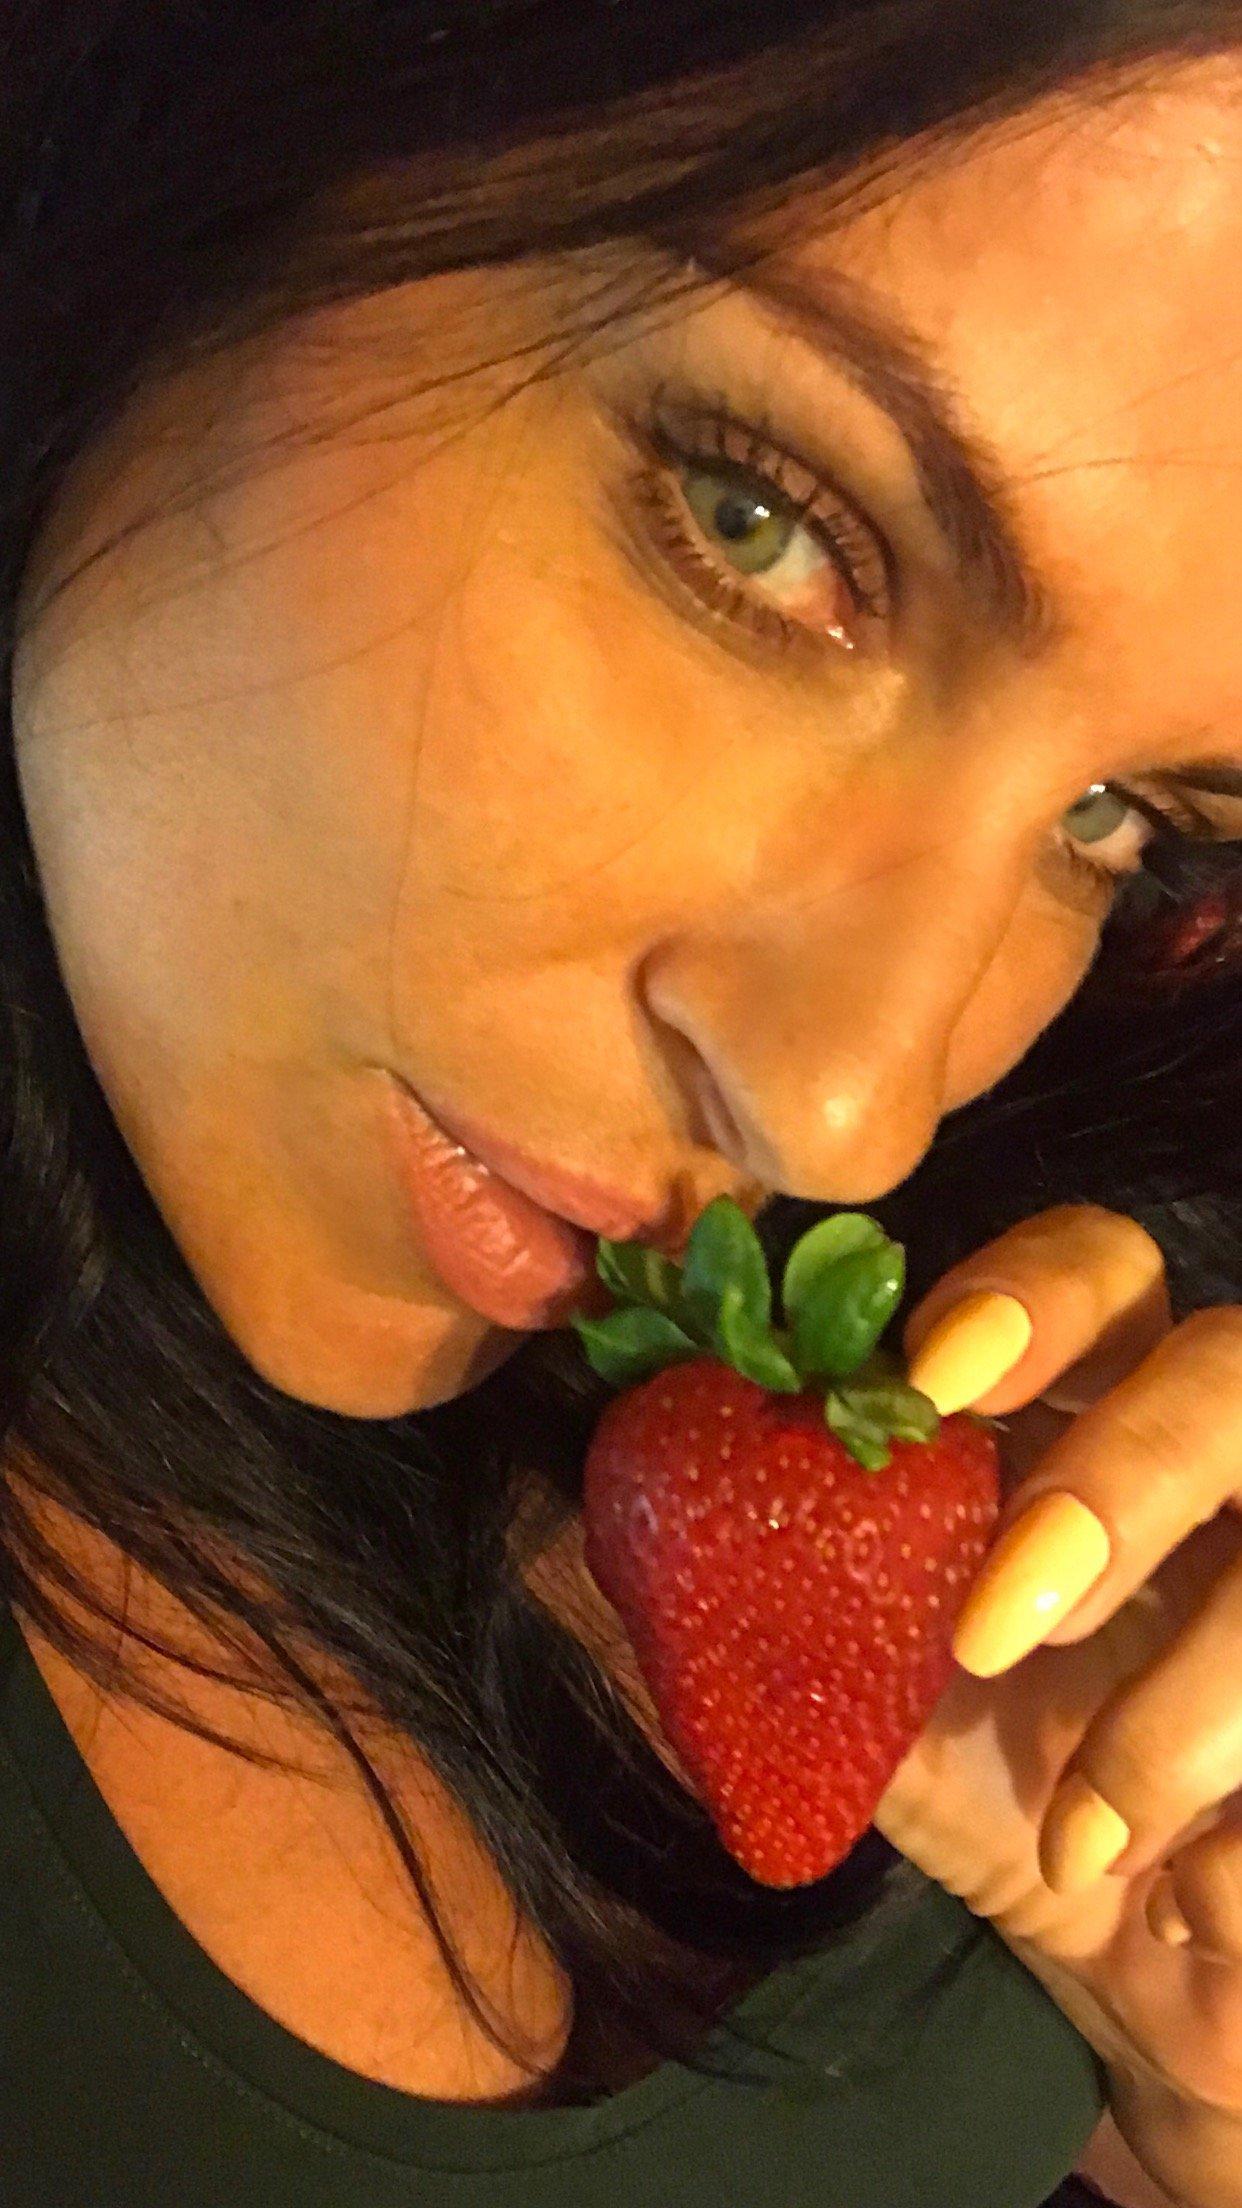 TheFappening : Elena Santarelli Nude Leaked